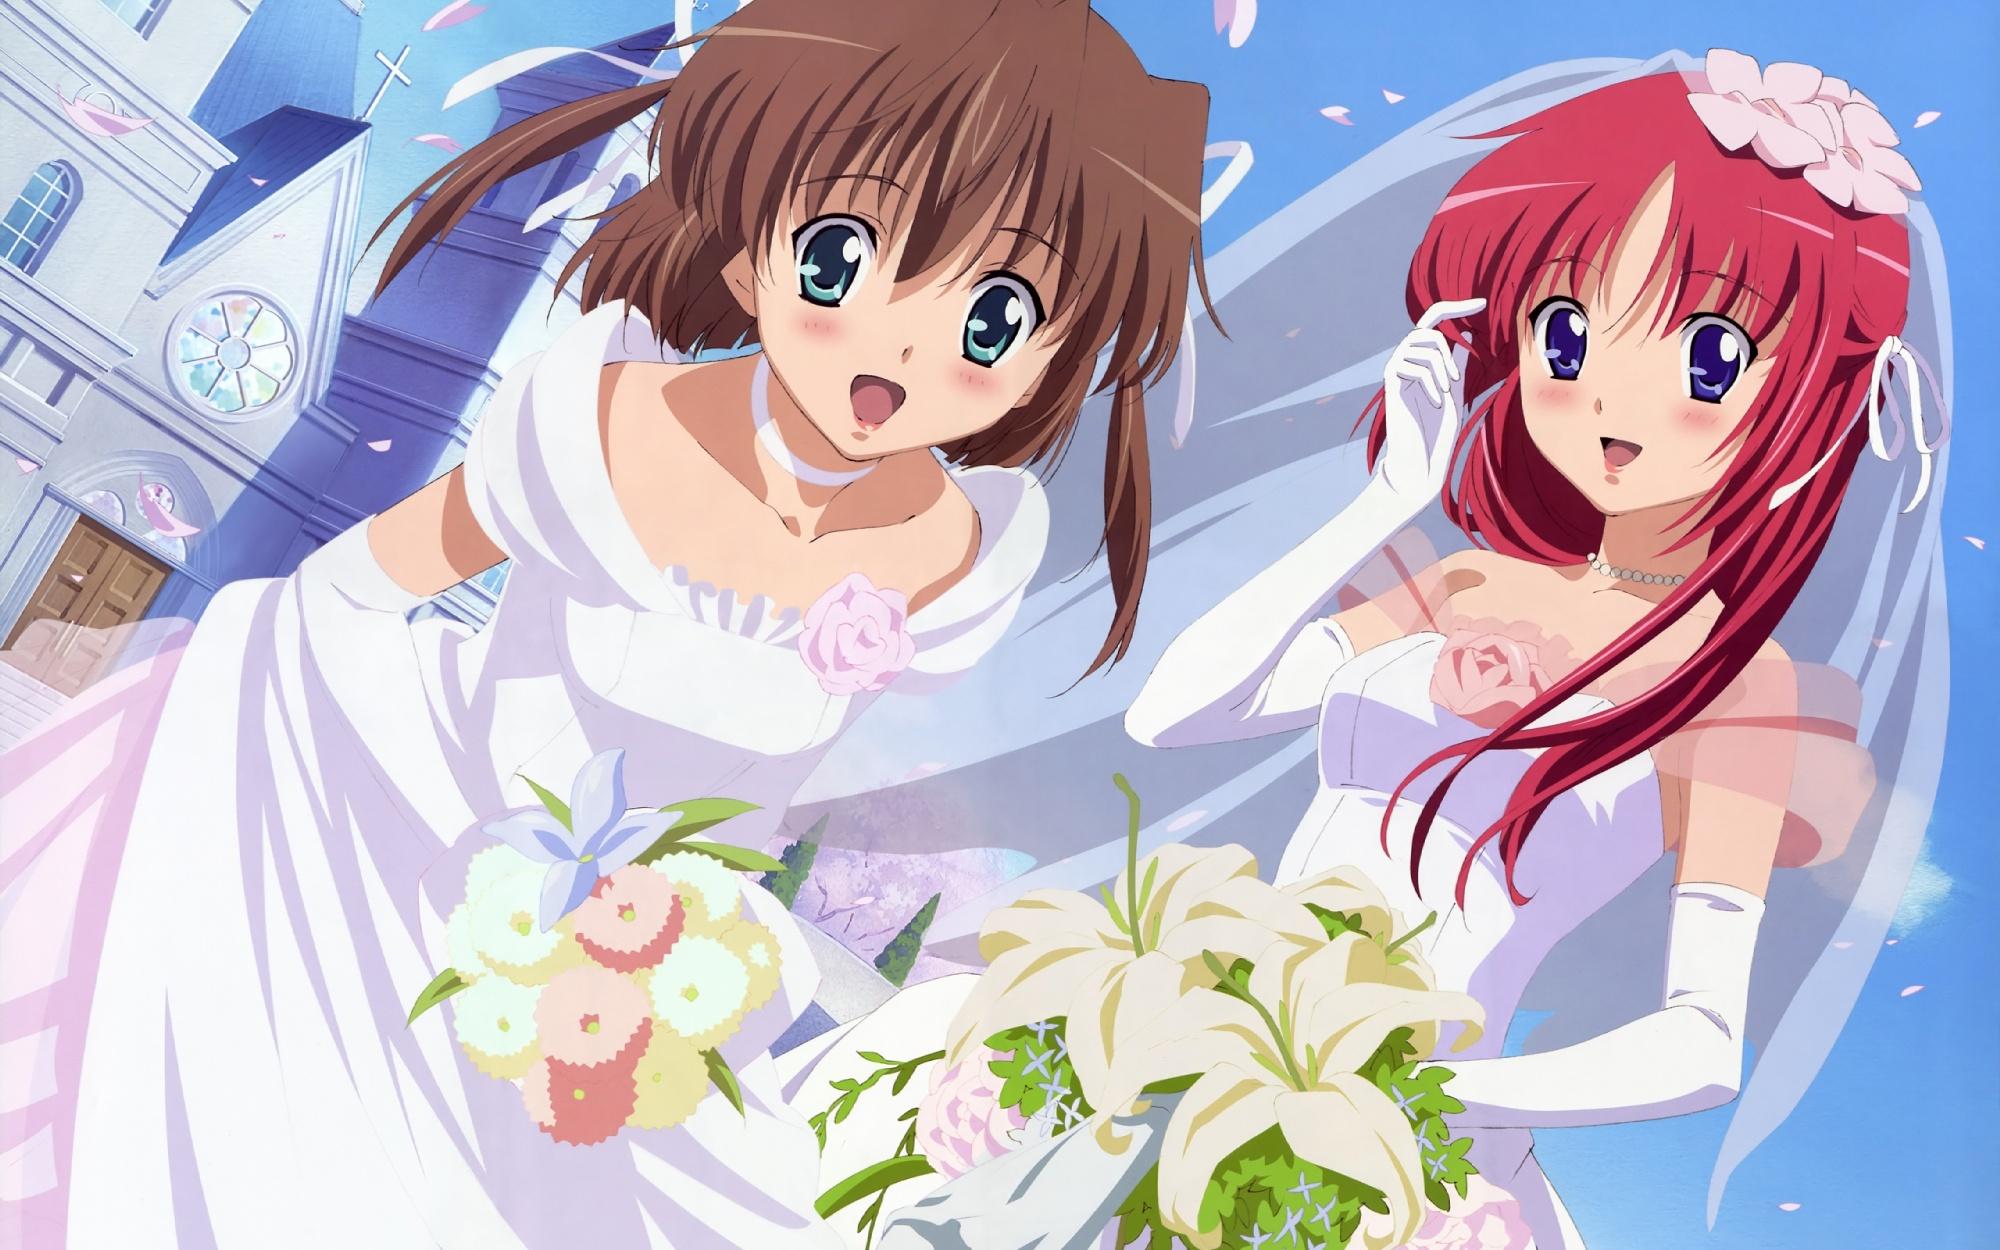 2girls asakura_nemu da_capo shirakawa_kotori wedding wedding_attire